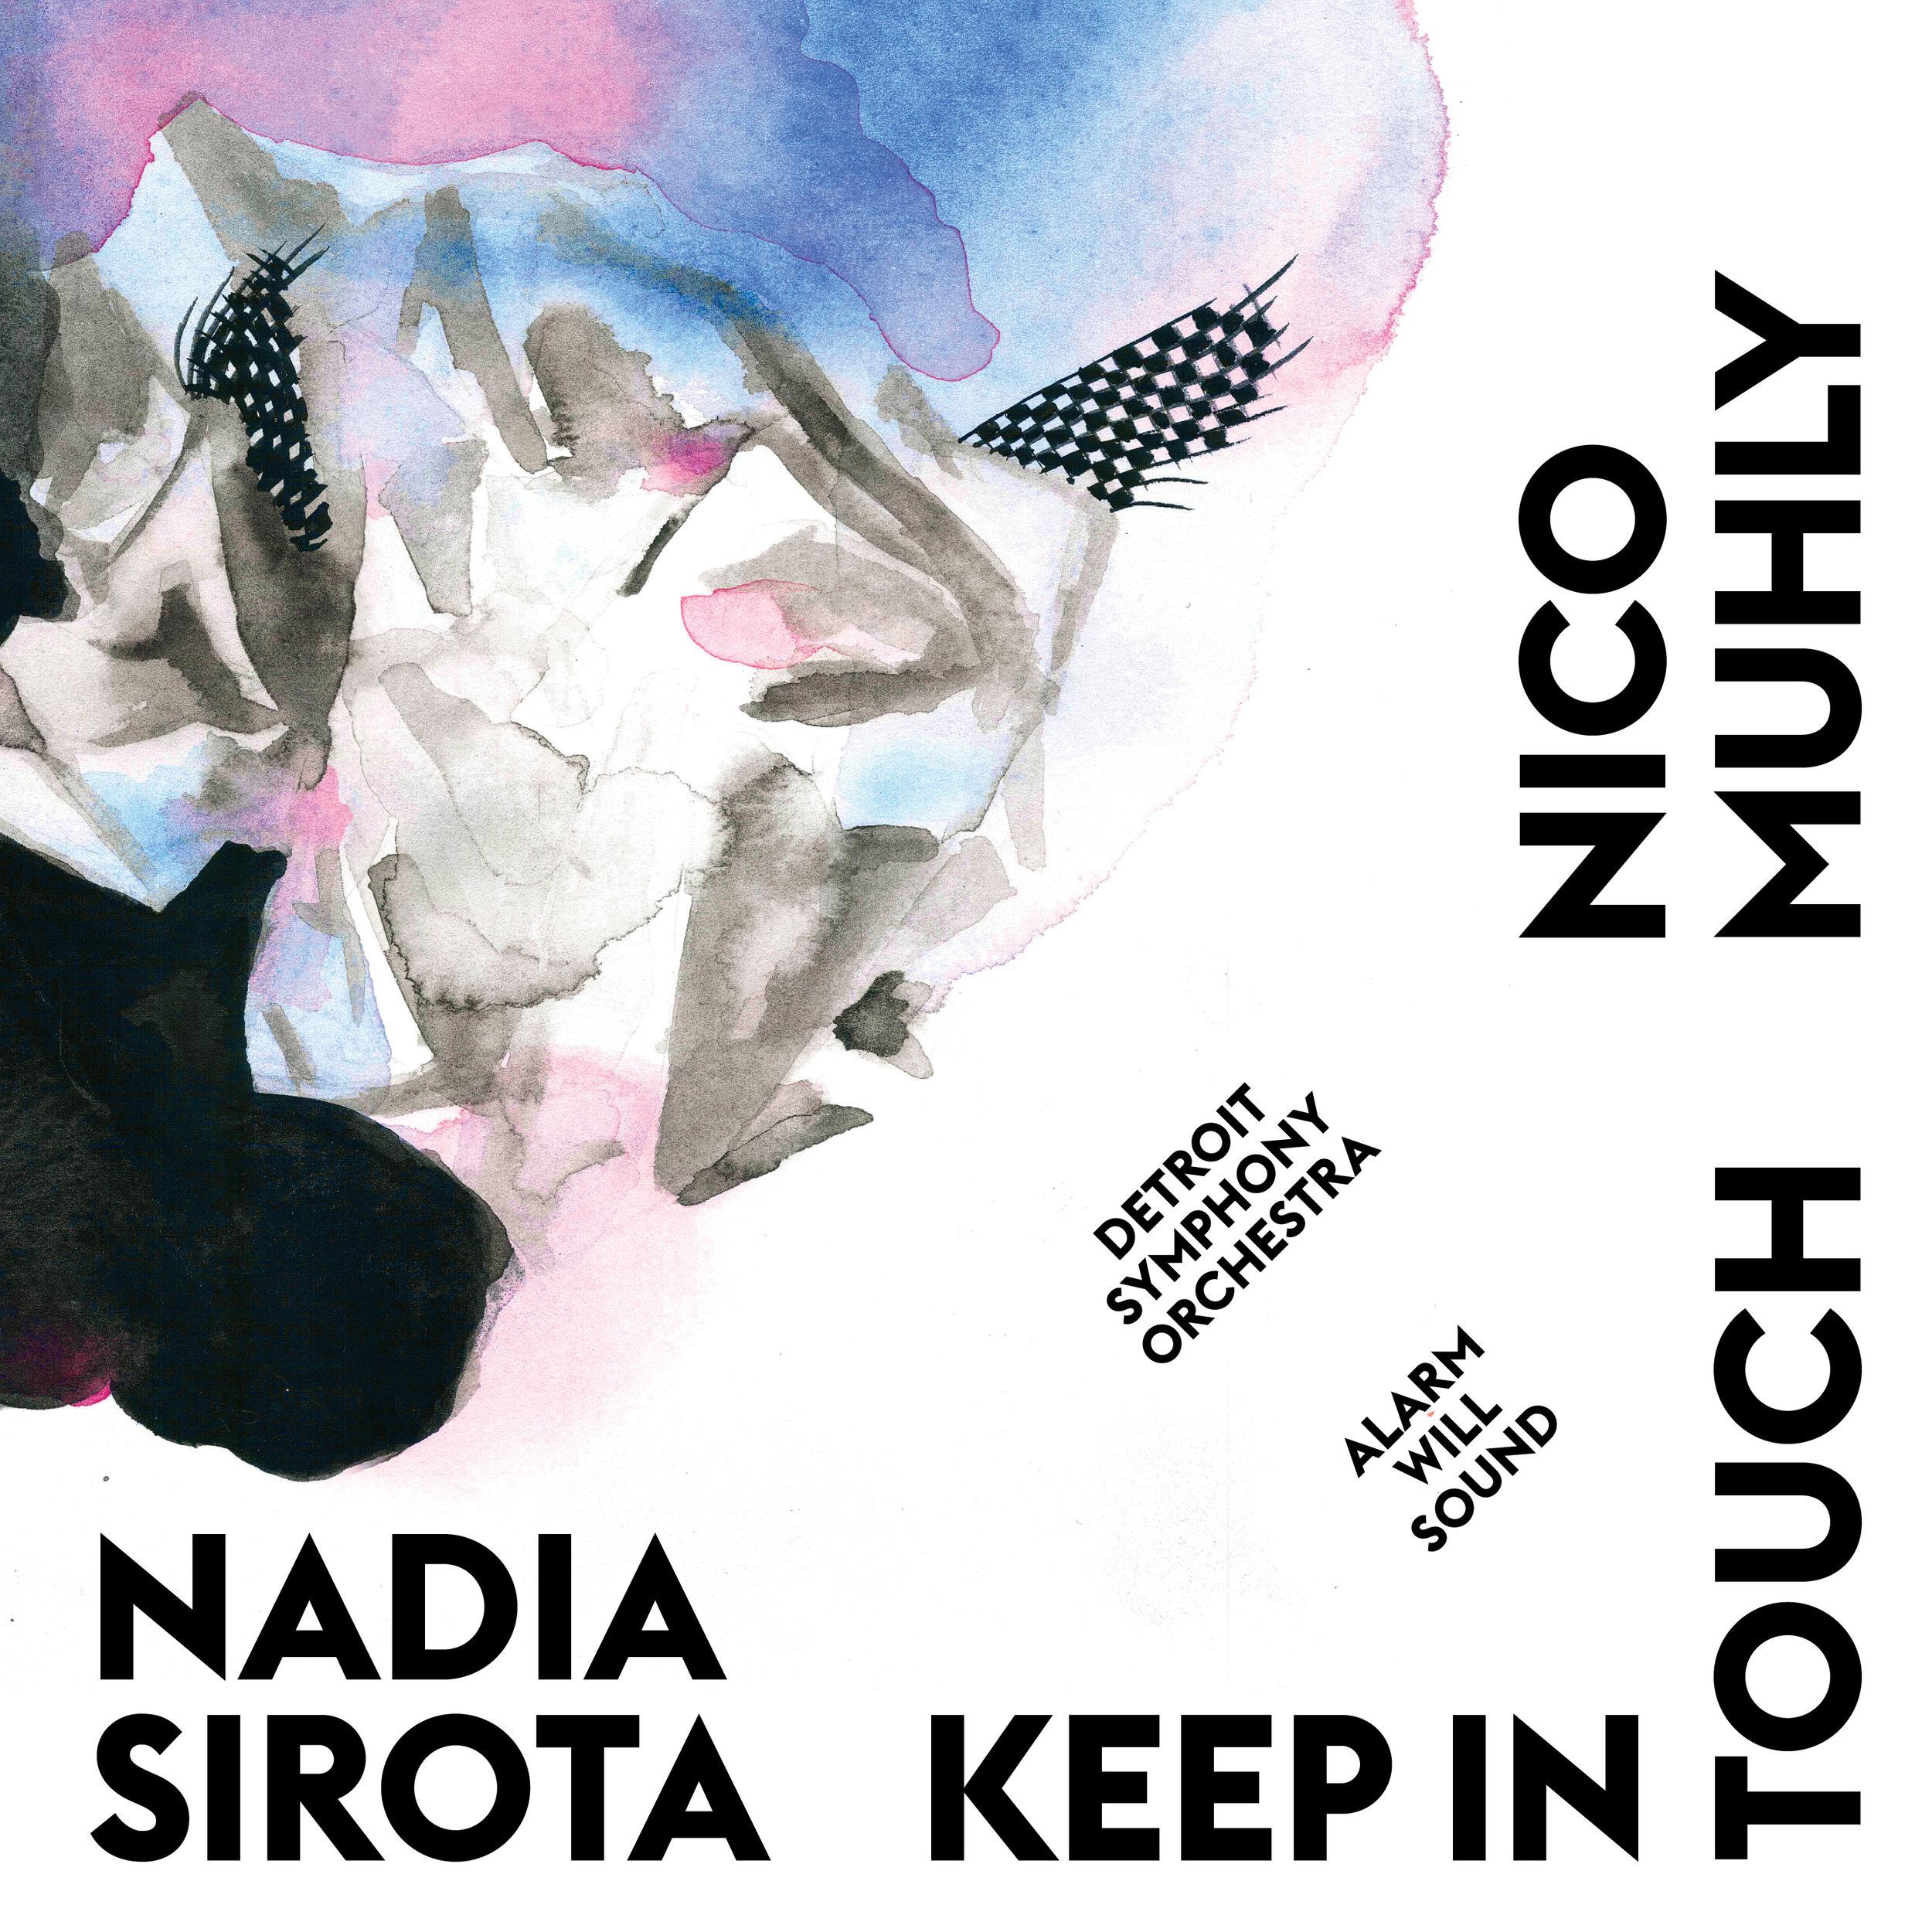 NICO MUHLY | NADIA SIROTAKEEP IN TOUCH - DIGITAL